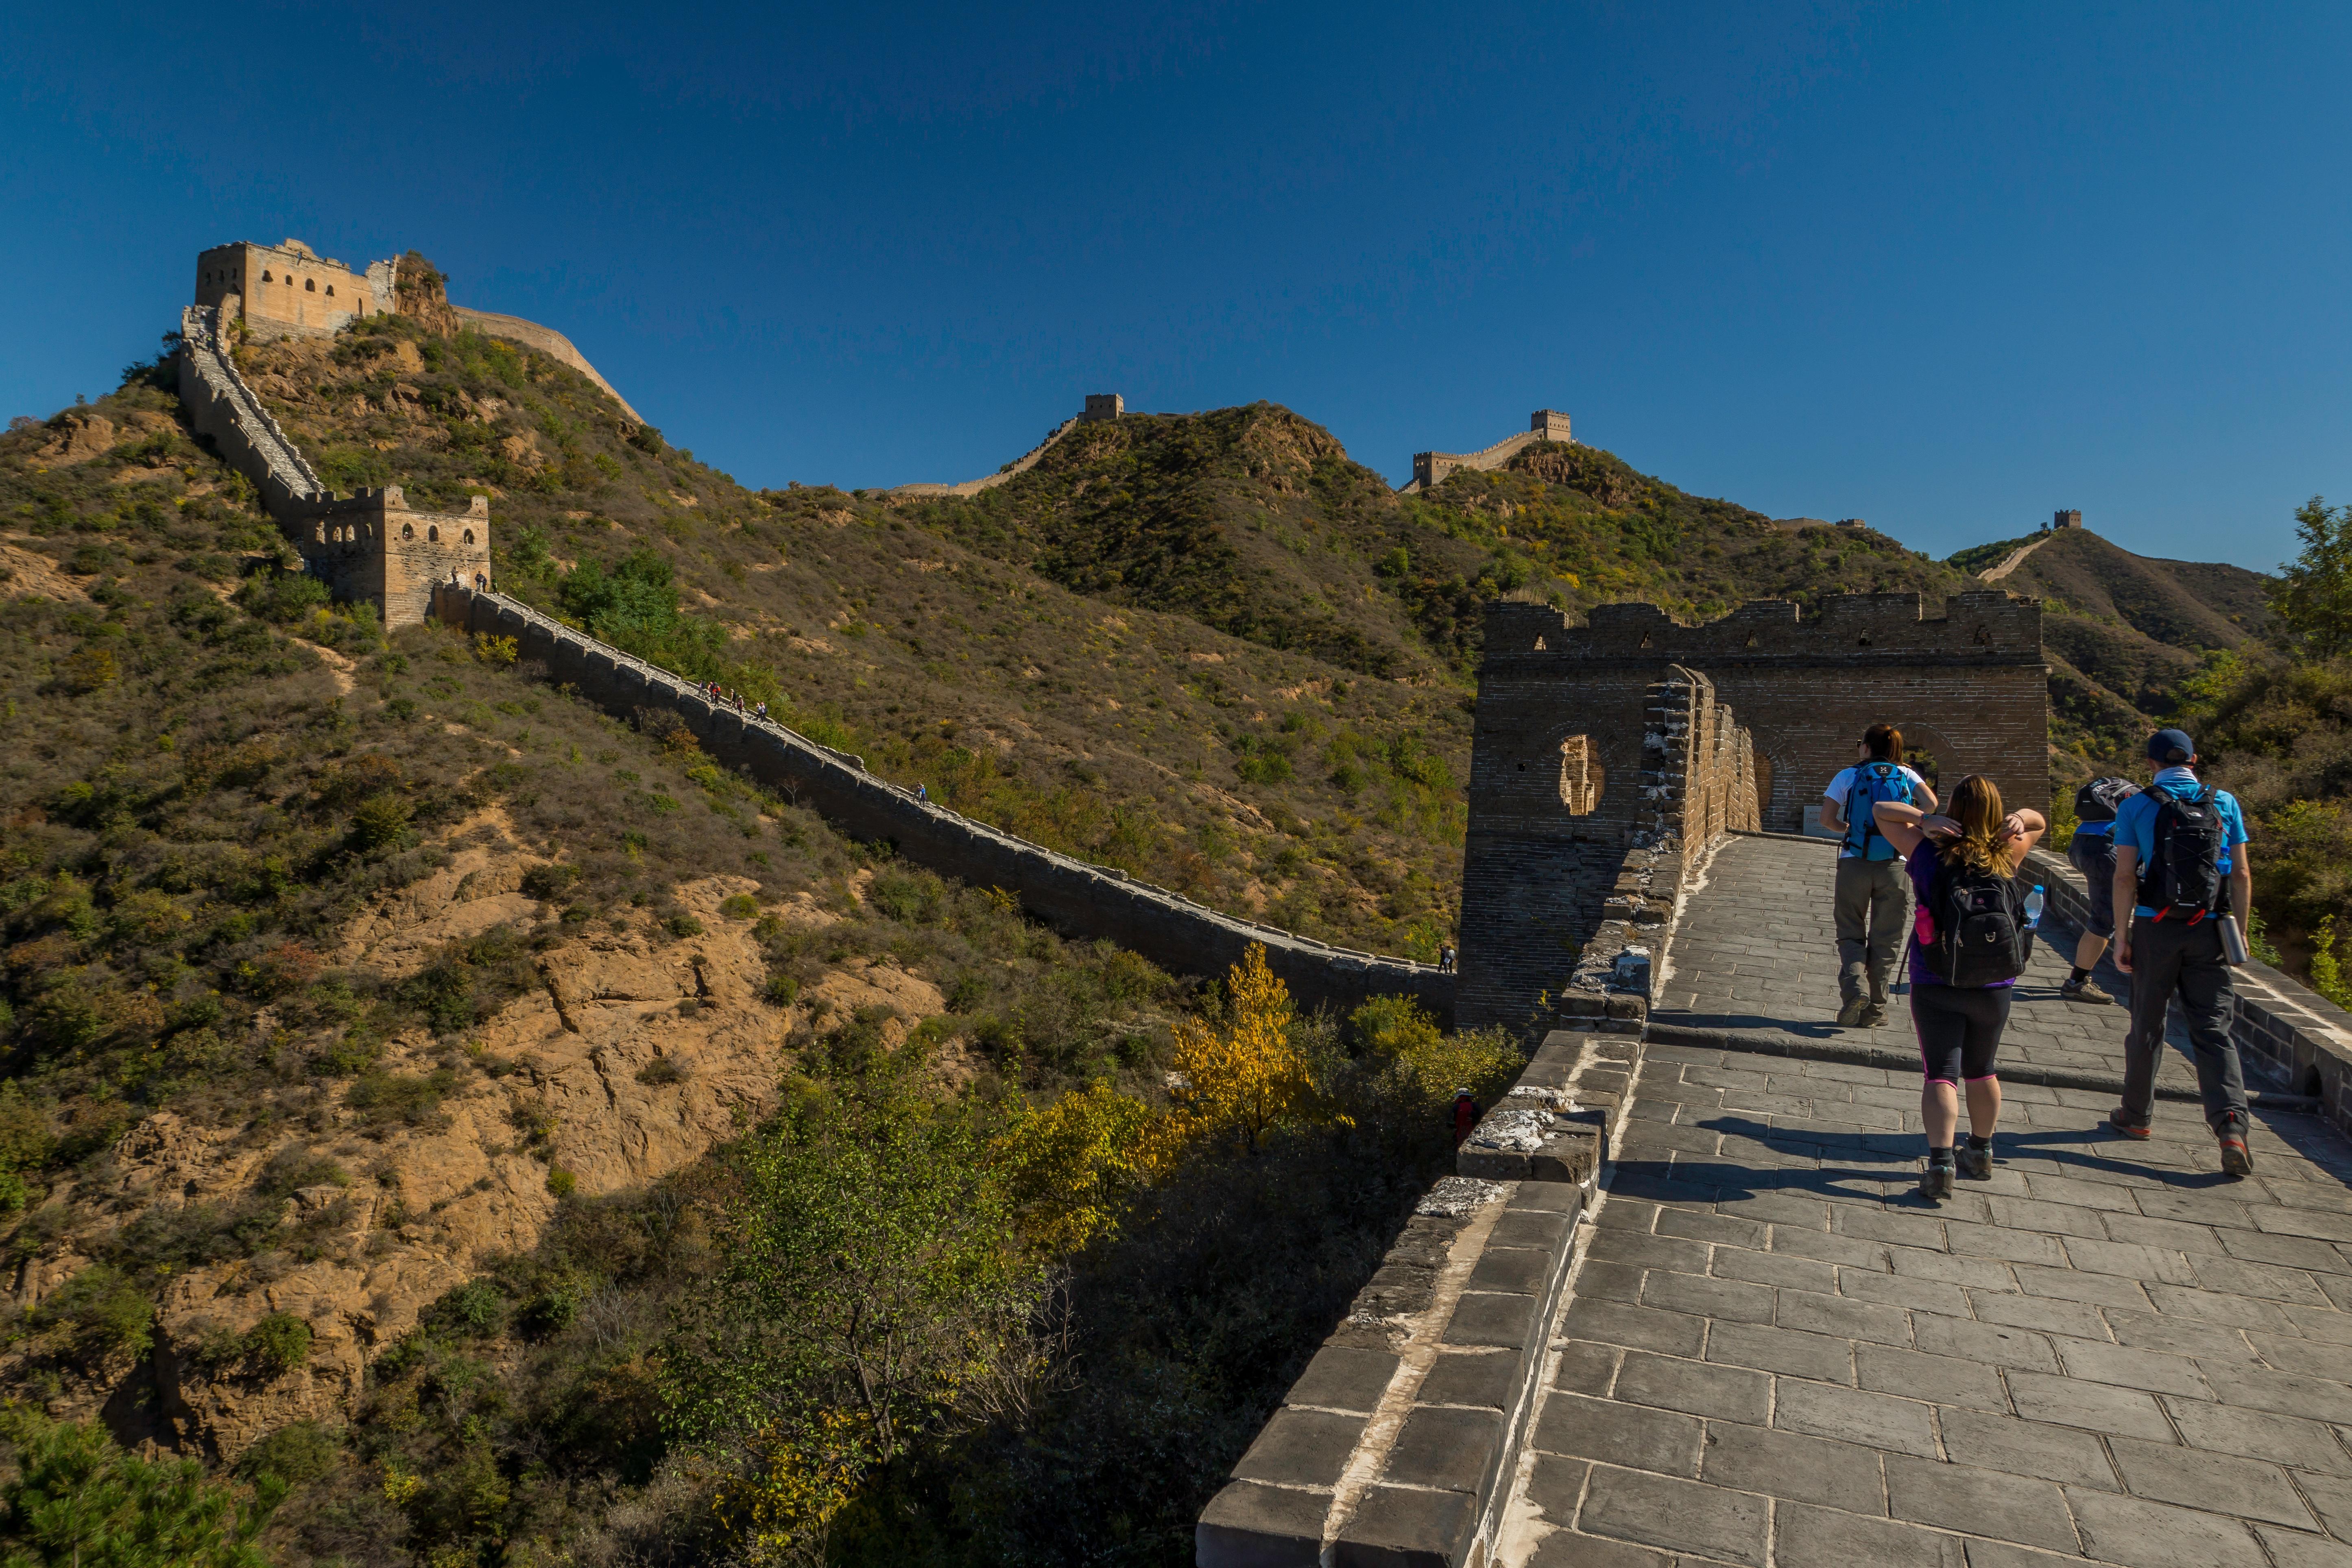 Great_Wall_of_China_view.jpg